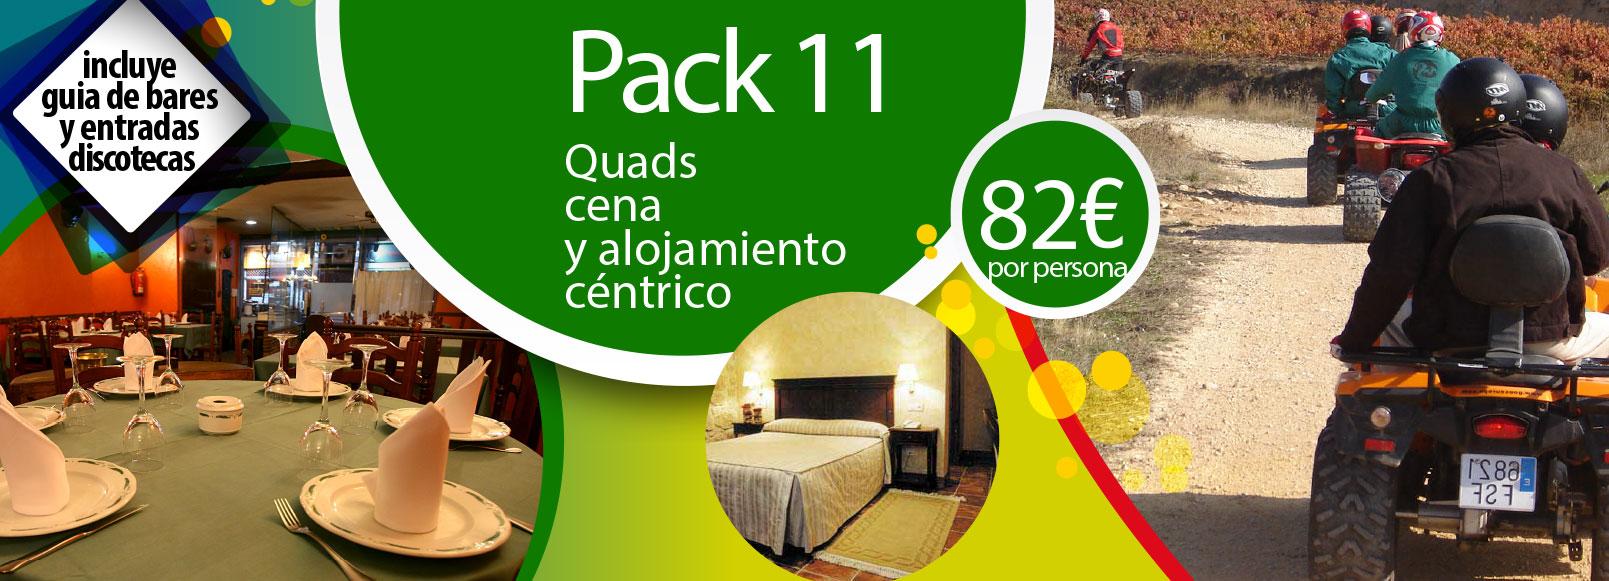 Pack 11: Quads, cena y alojamiento